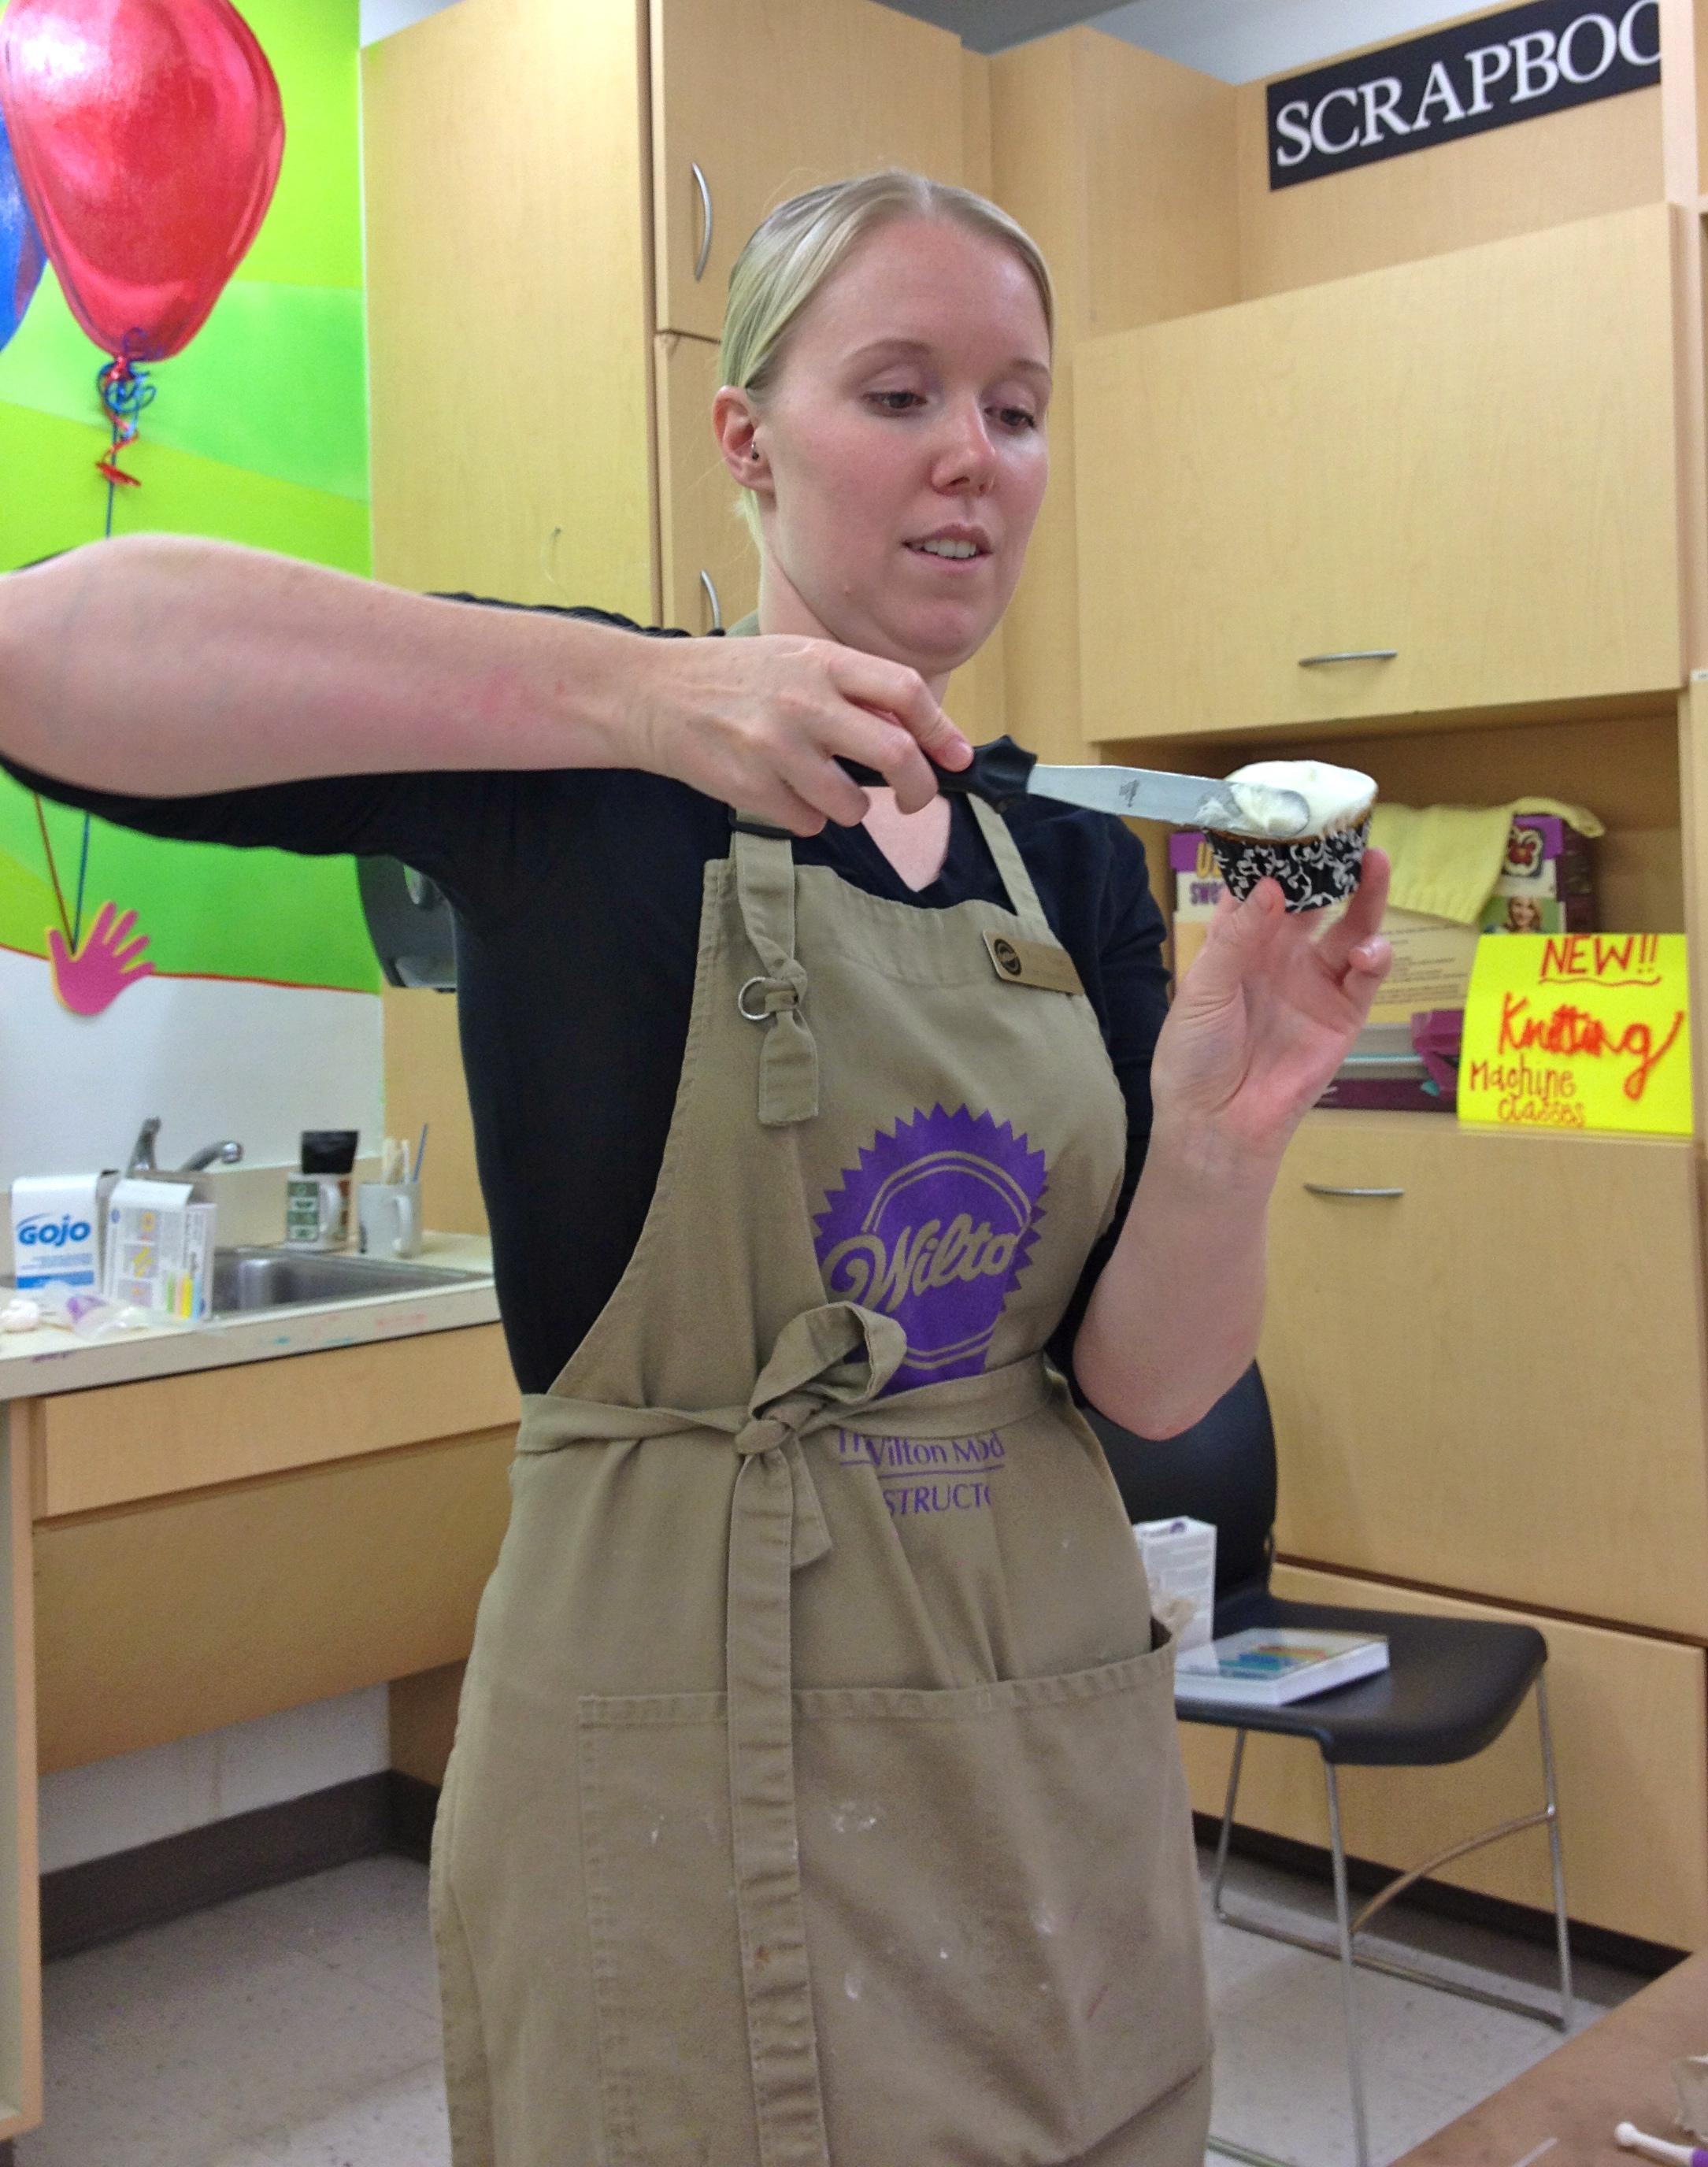 michaels cake decorating classes vetwillcom - Michaels Cake Decorating Class